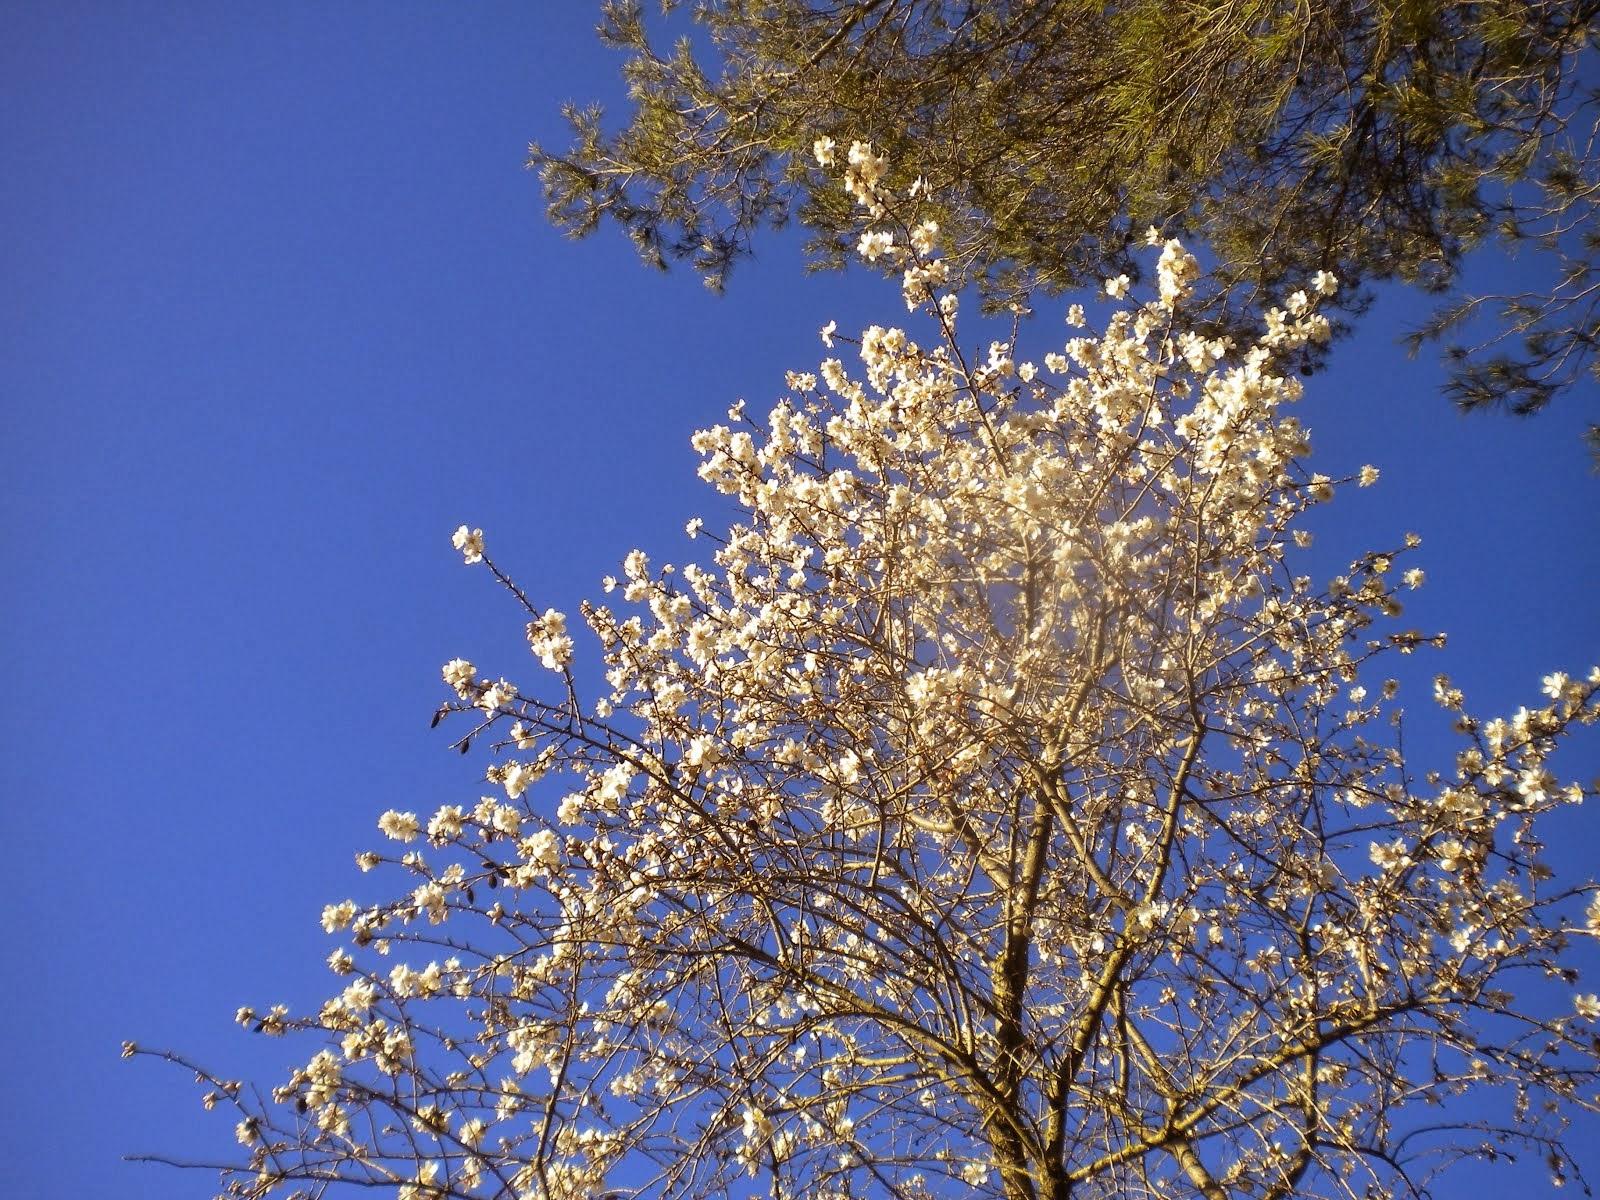 Ametller florit. Febrer II 2014